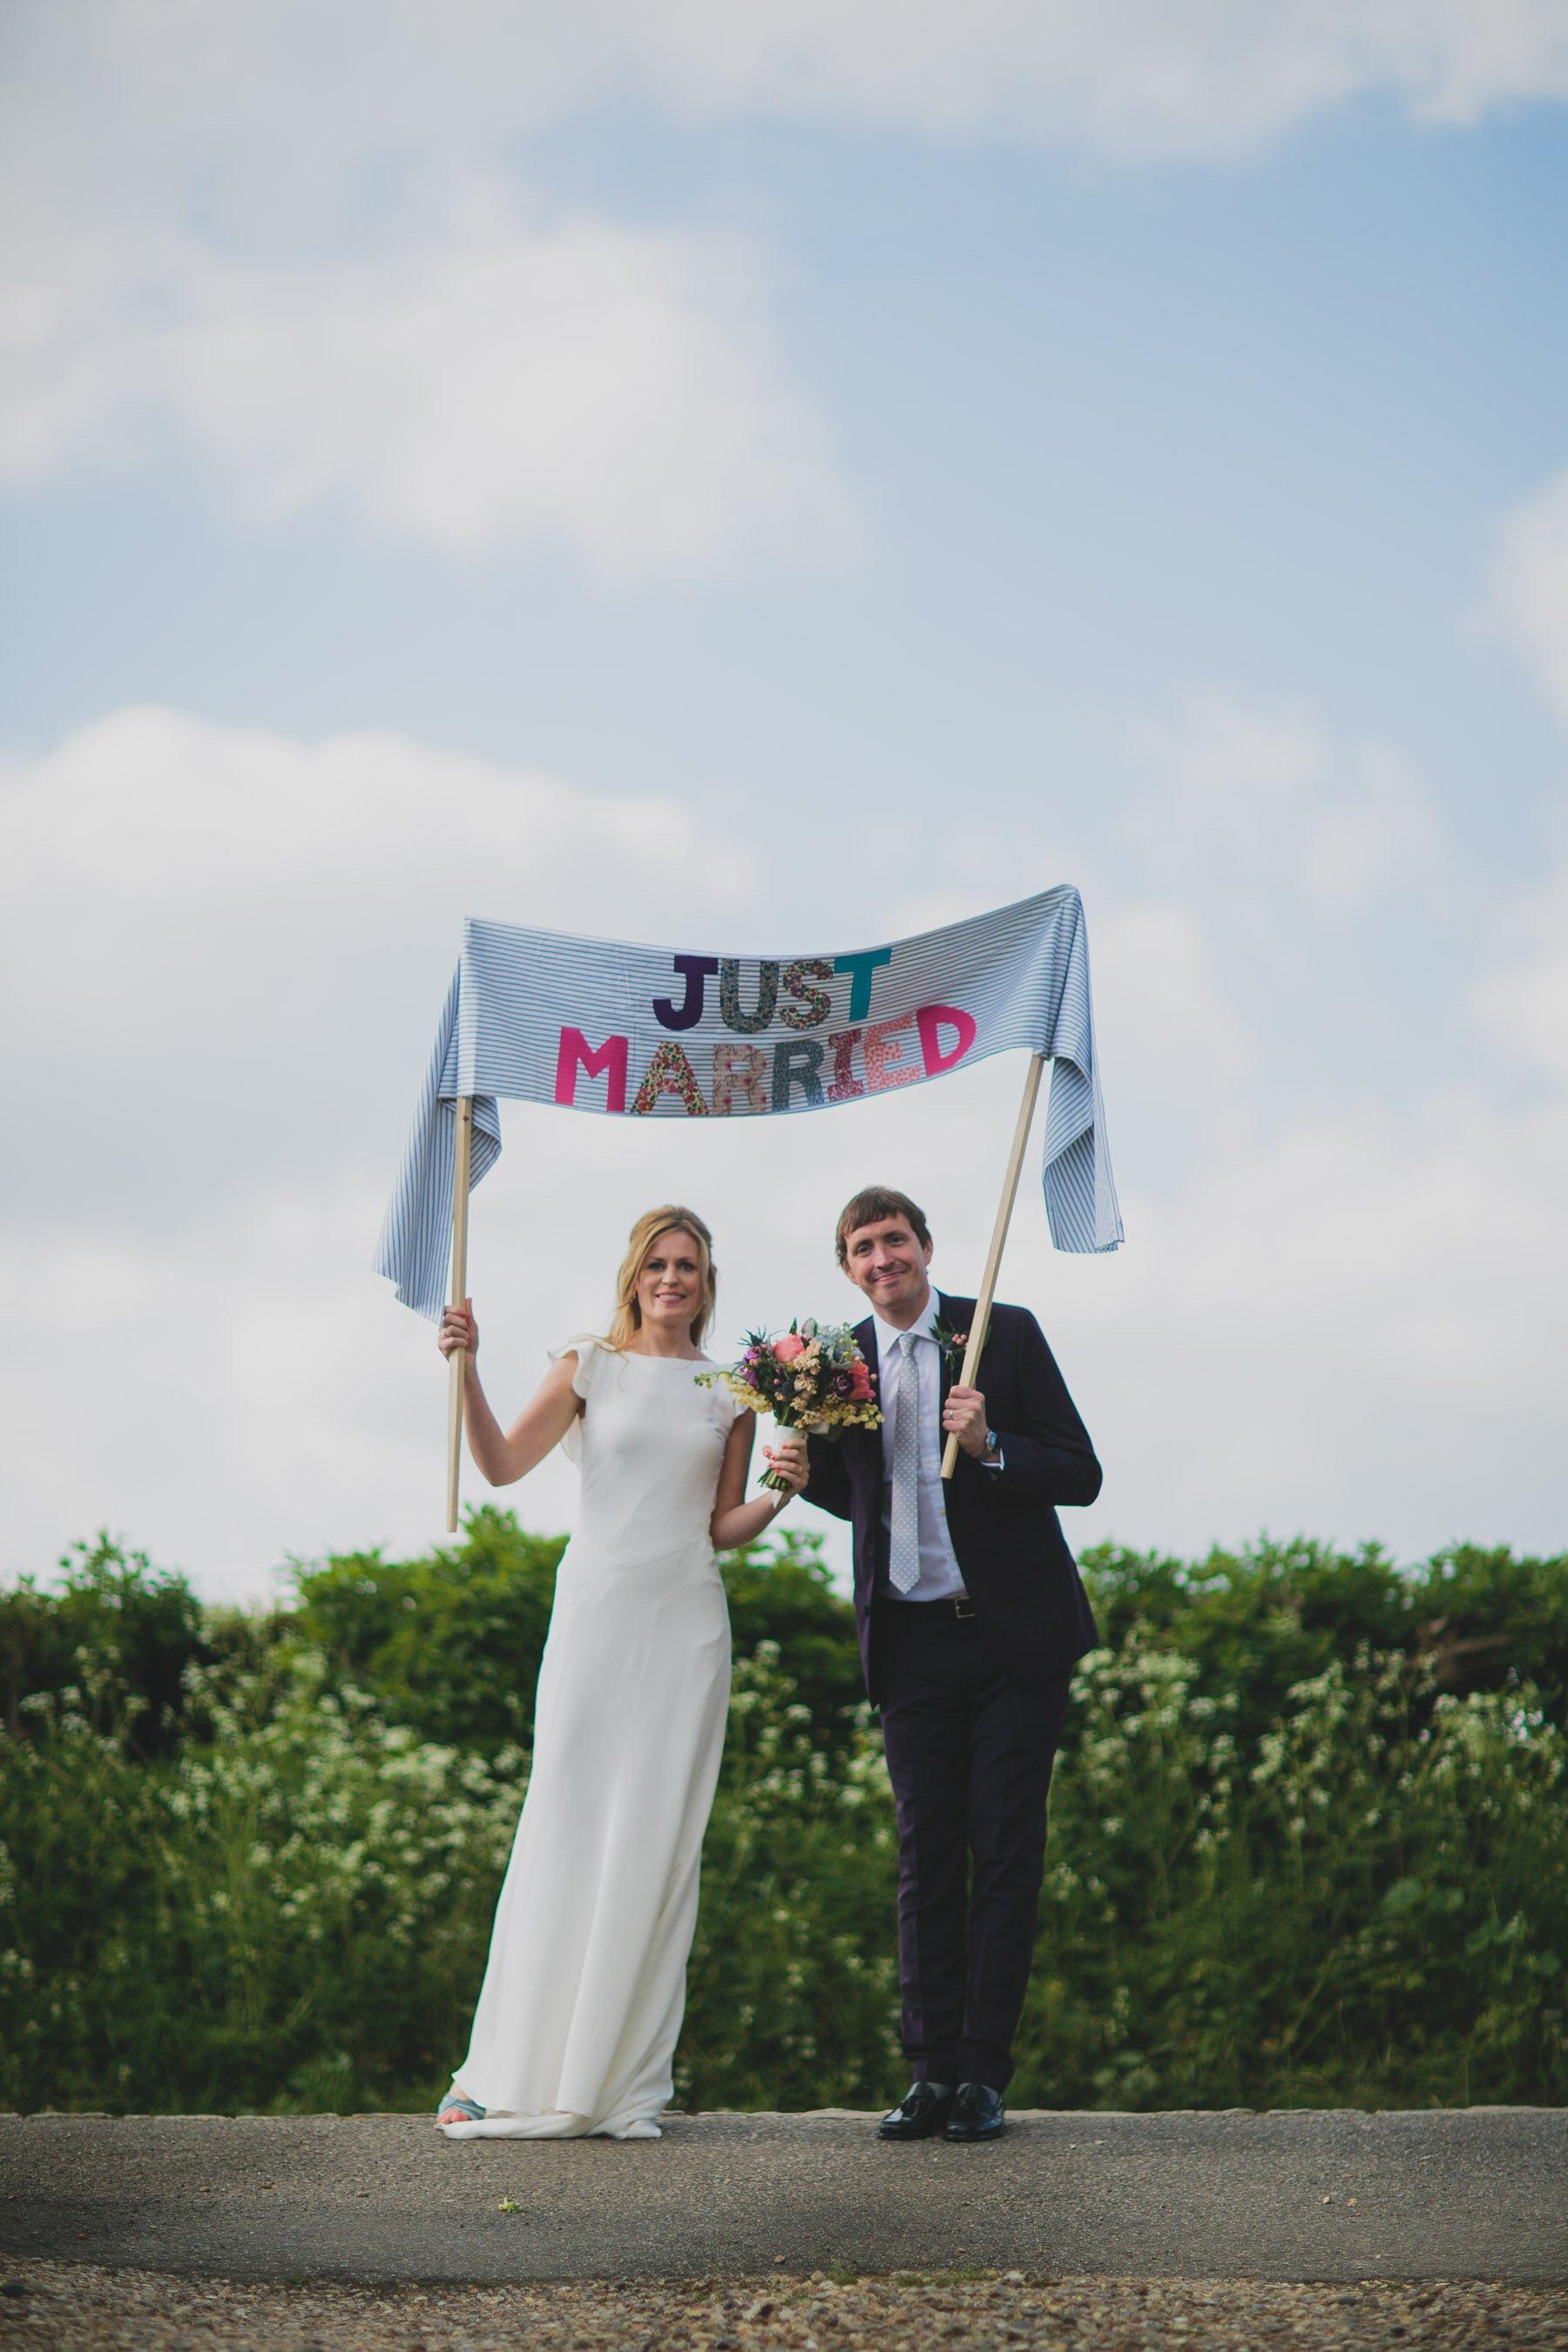 Buckinghamshire-Wedding-Lizzie-Duncan-106